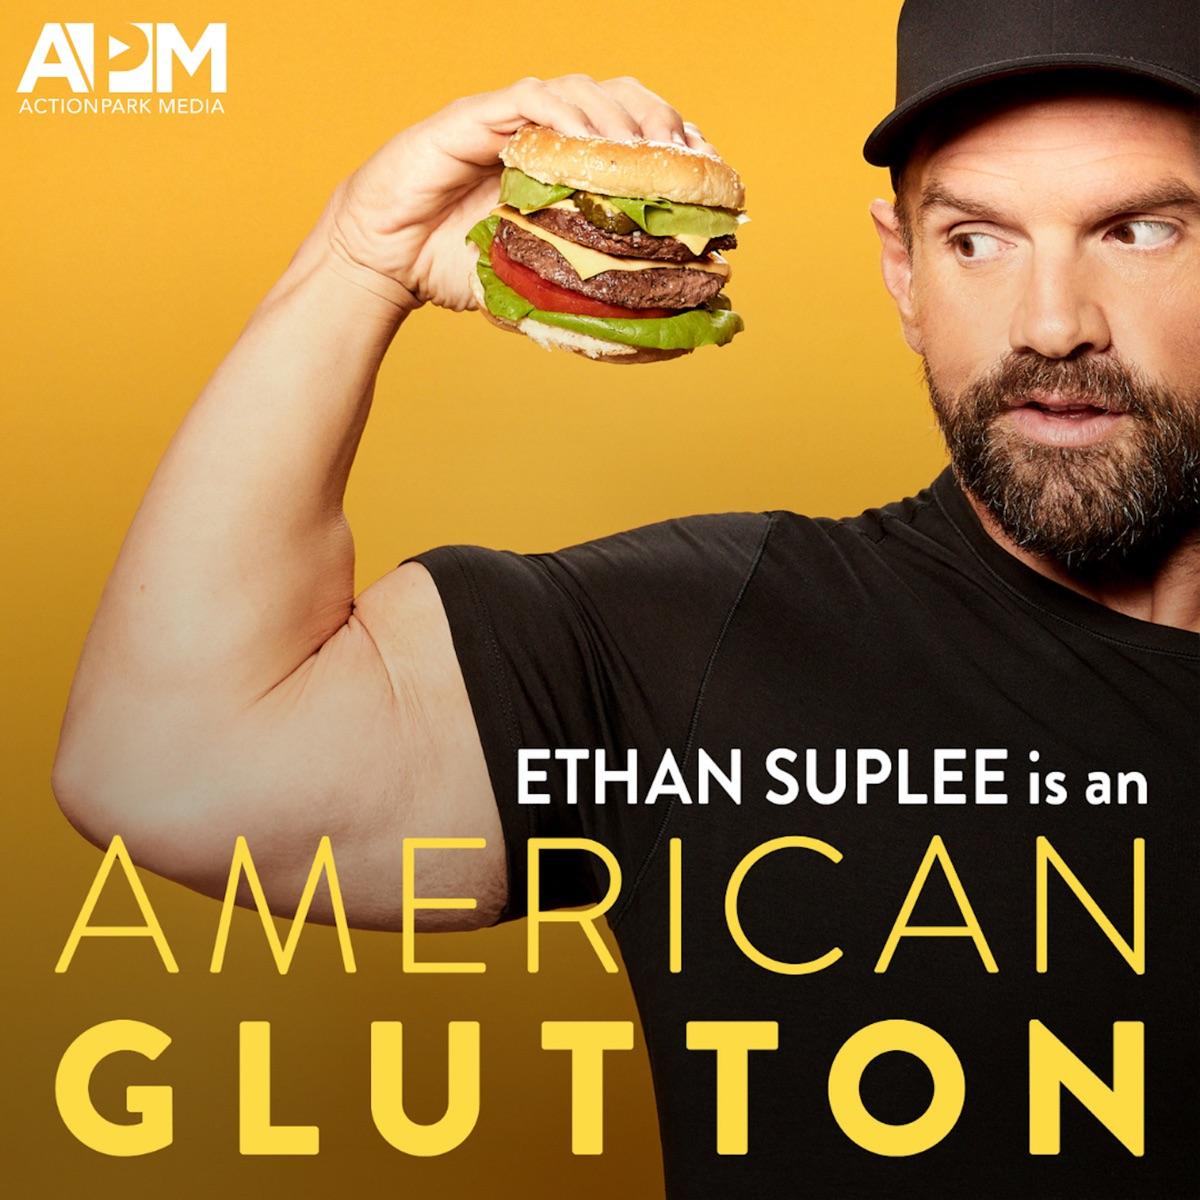 American Glutton